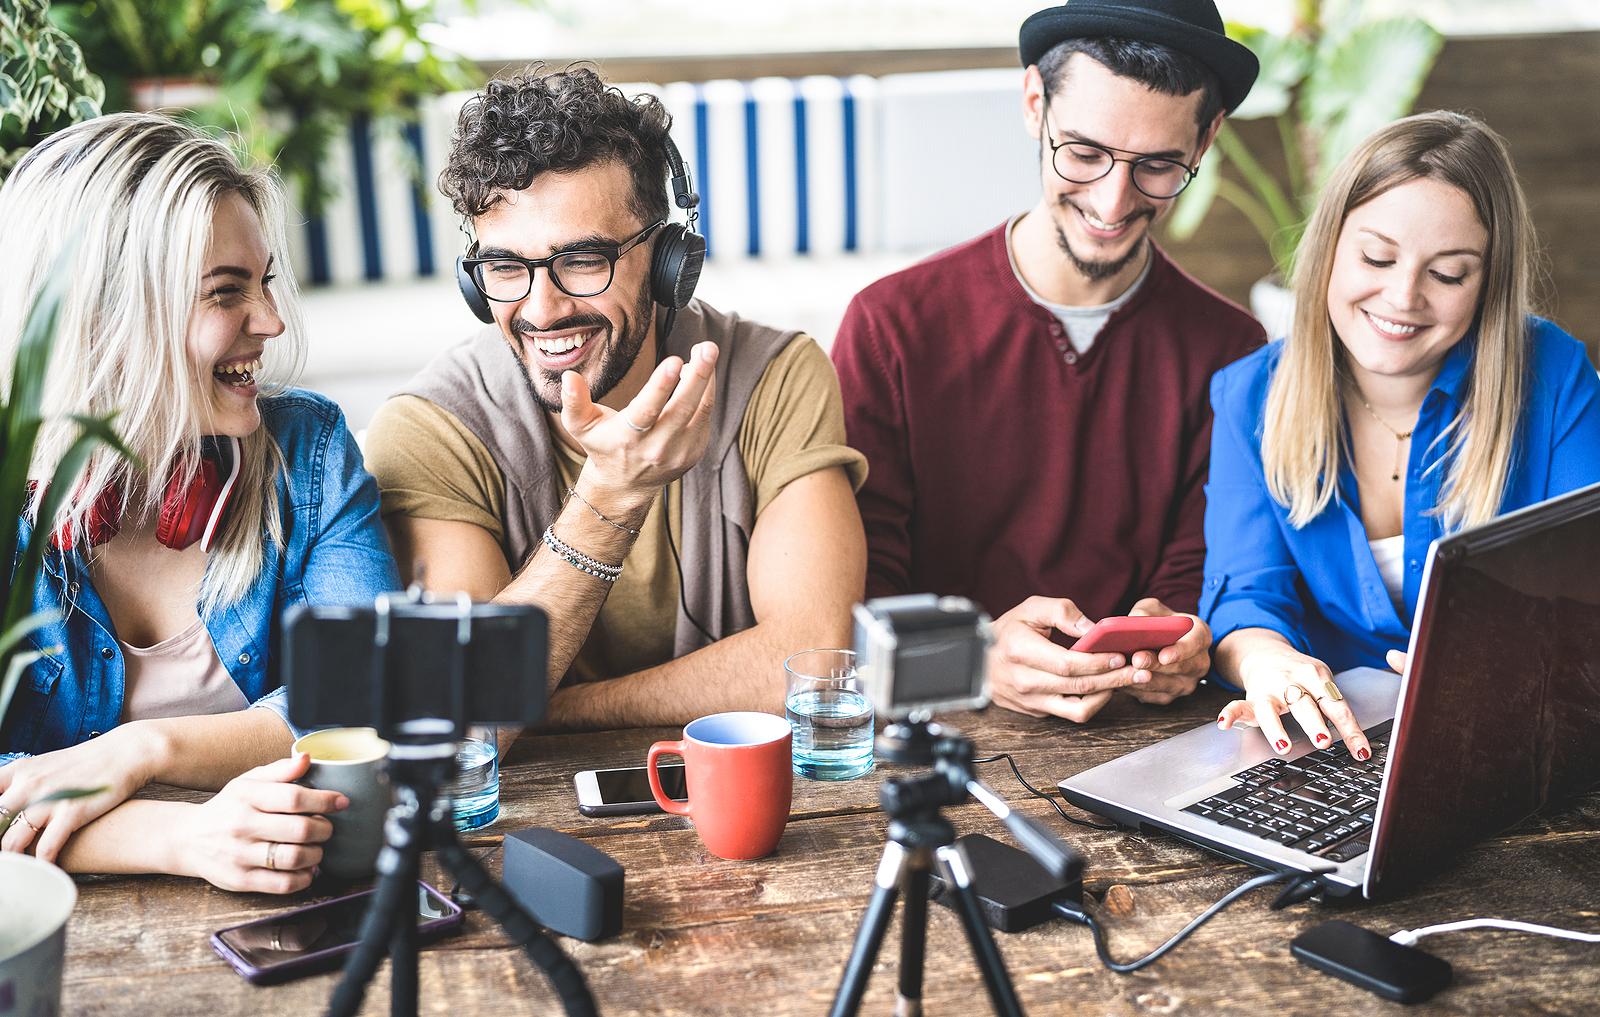 5 Startup Biz Tactics for Millennials